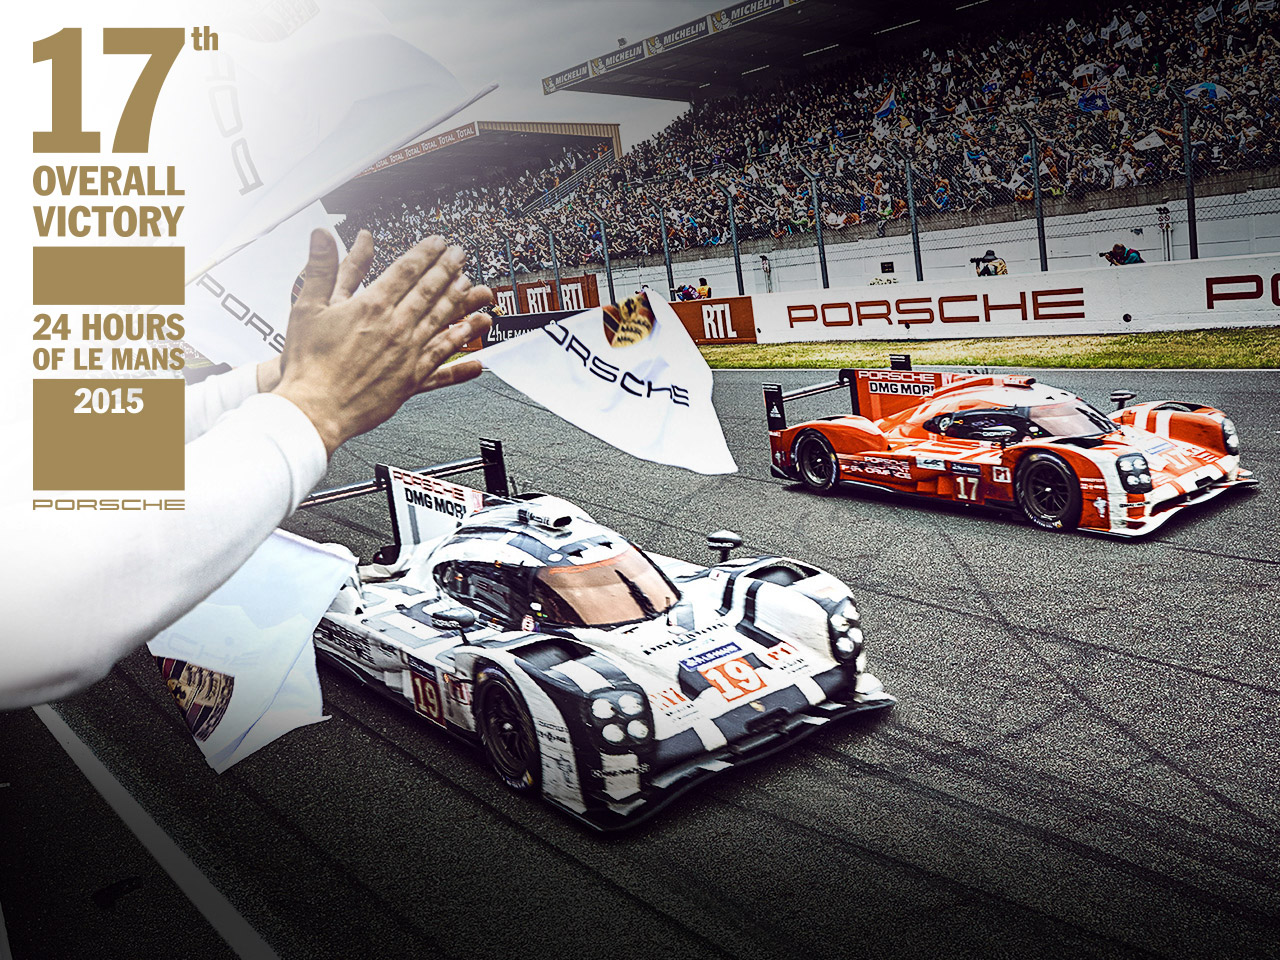 Porsche 17th overall victory: Porsche wins 24h Le Mans